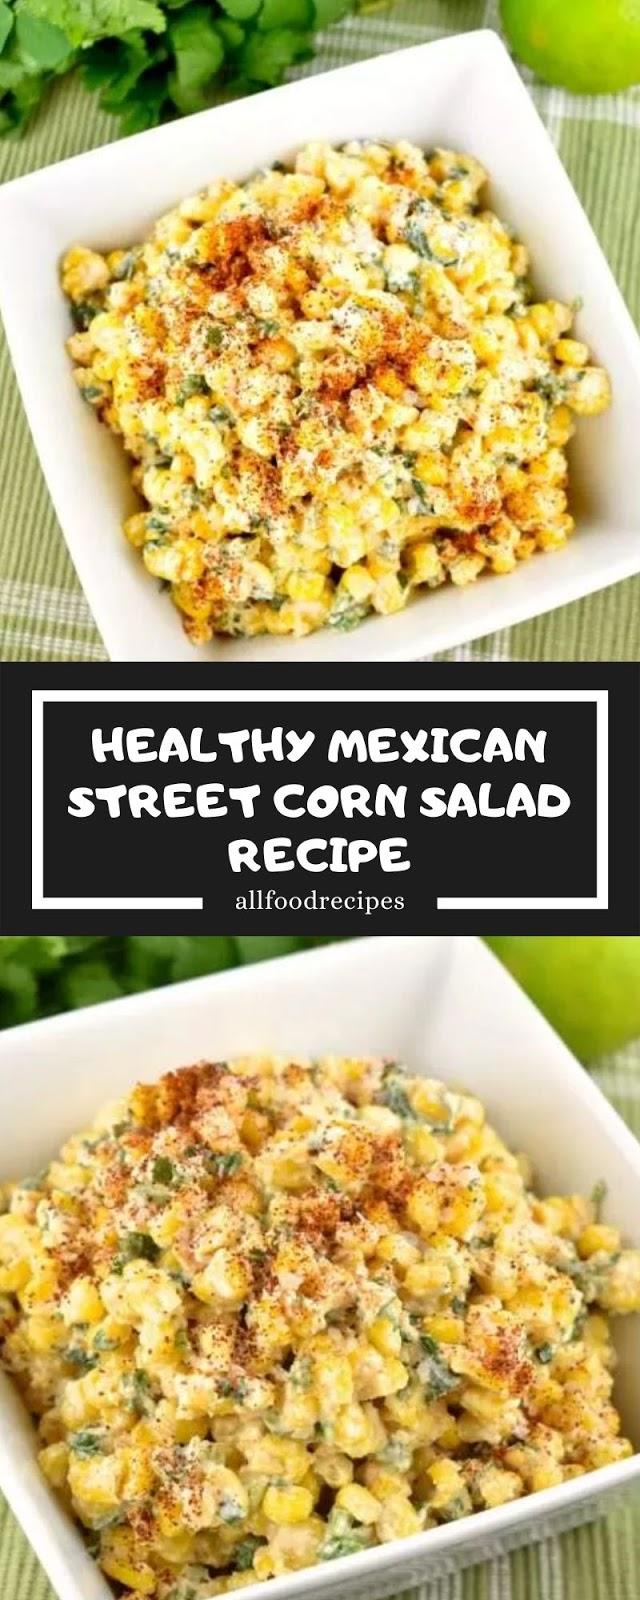 HEALTHY MEXICAN STREET CORN SALAD RECIPE